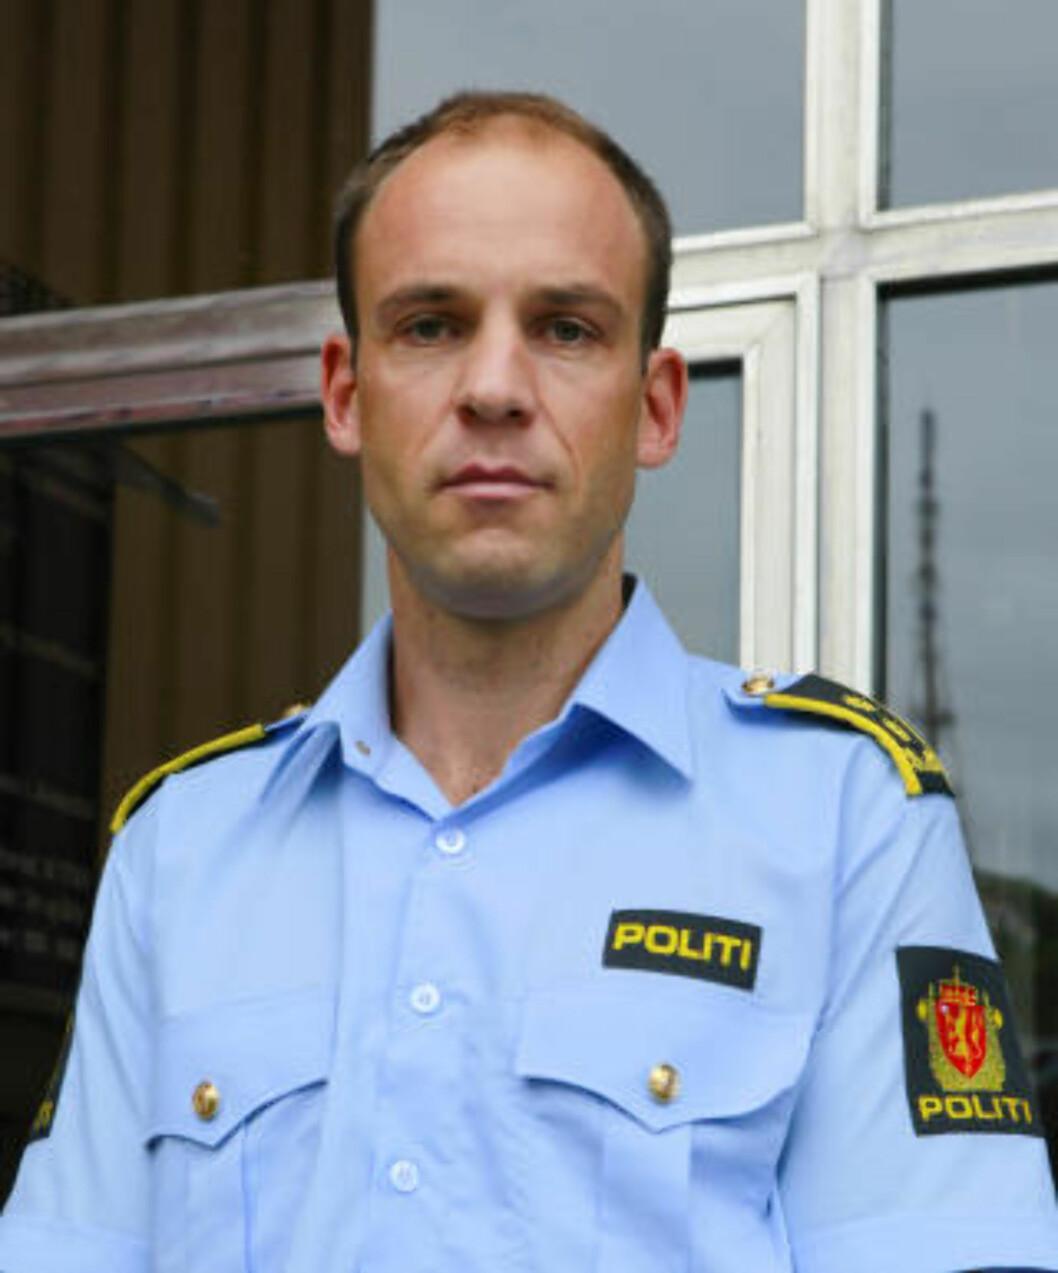 <strong>TAUS:</strong> Politiadvokat Håvard Ryengen. FOTO: TORBJØRN BERG / DAGBLADET